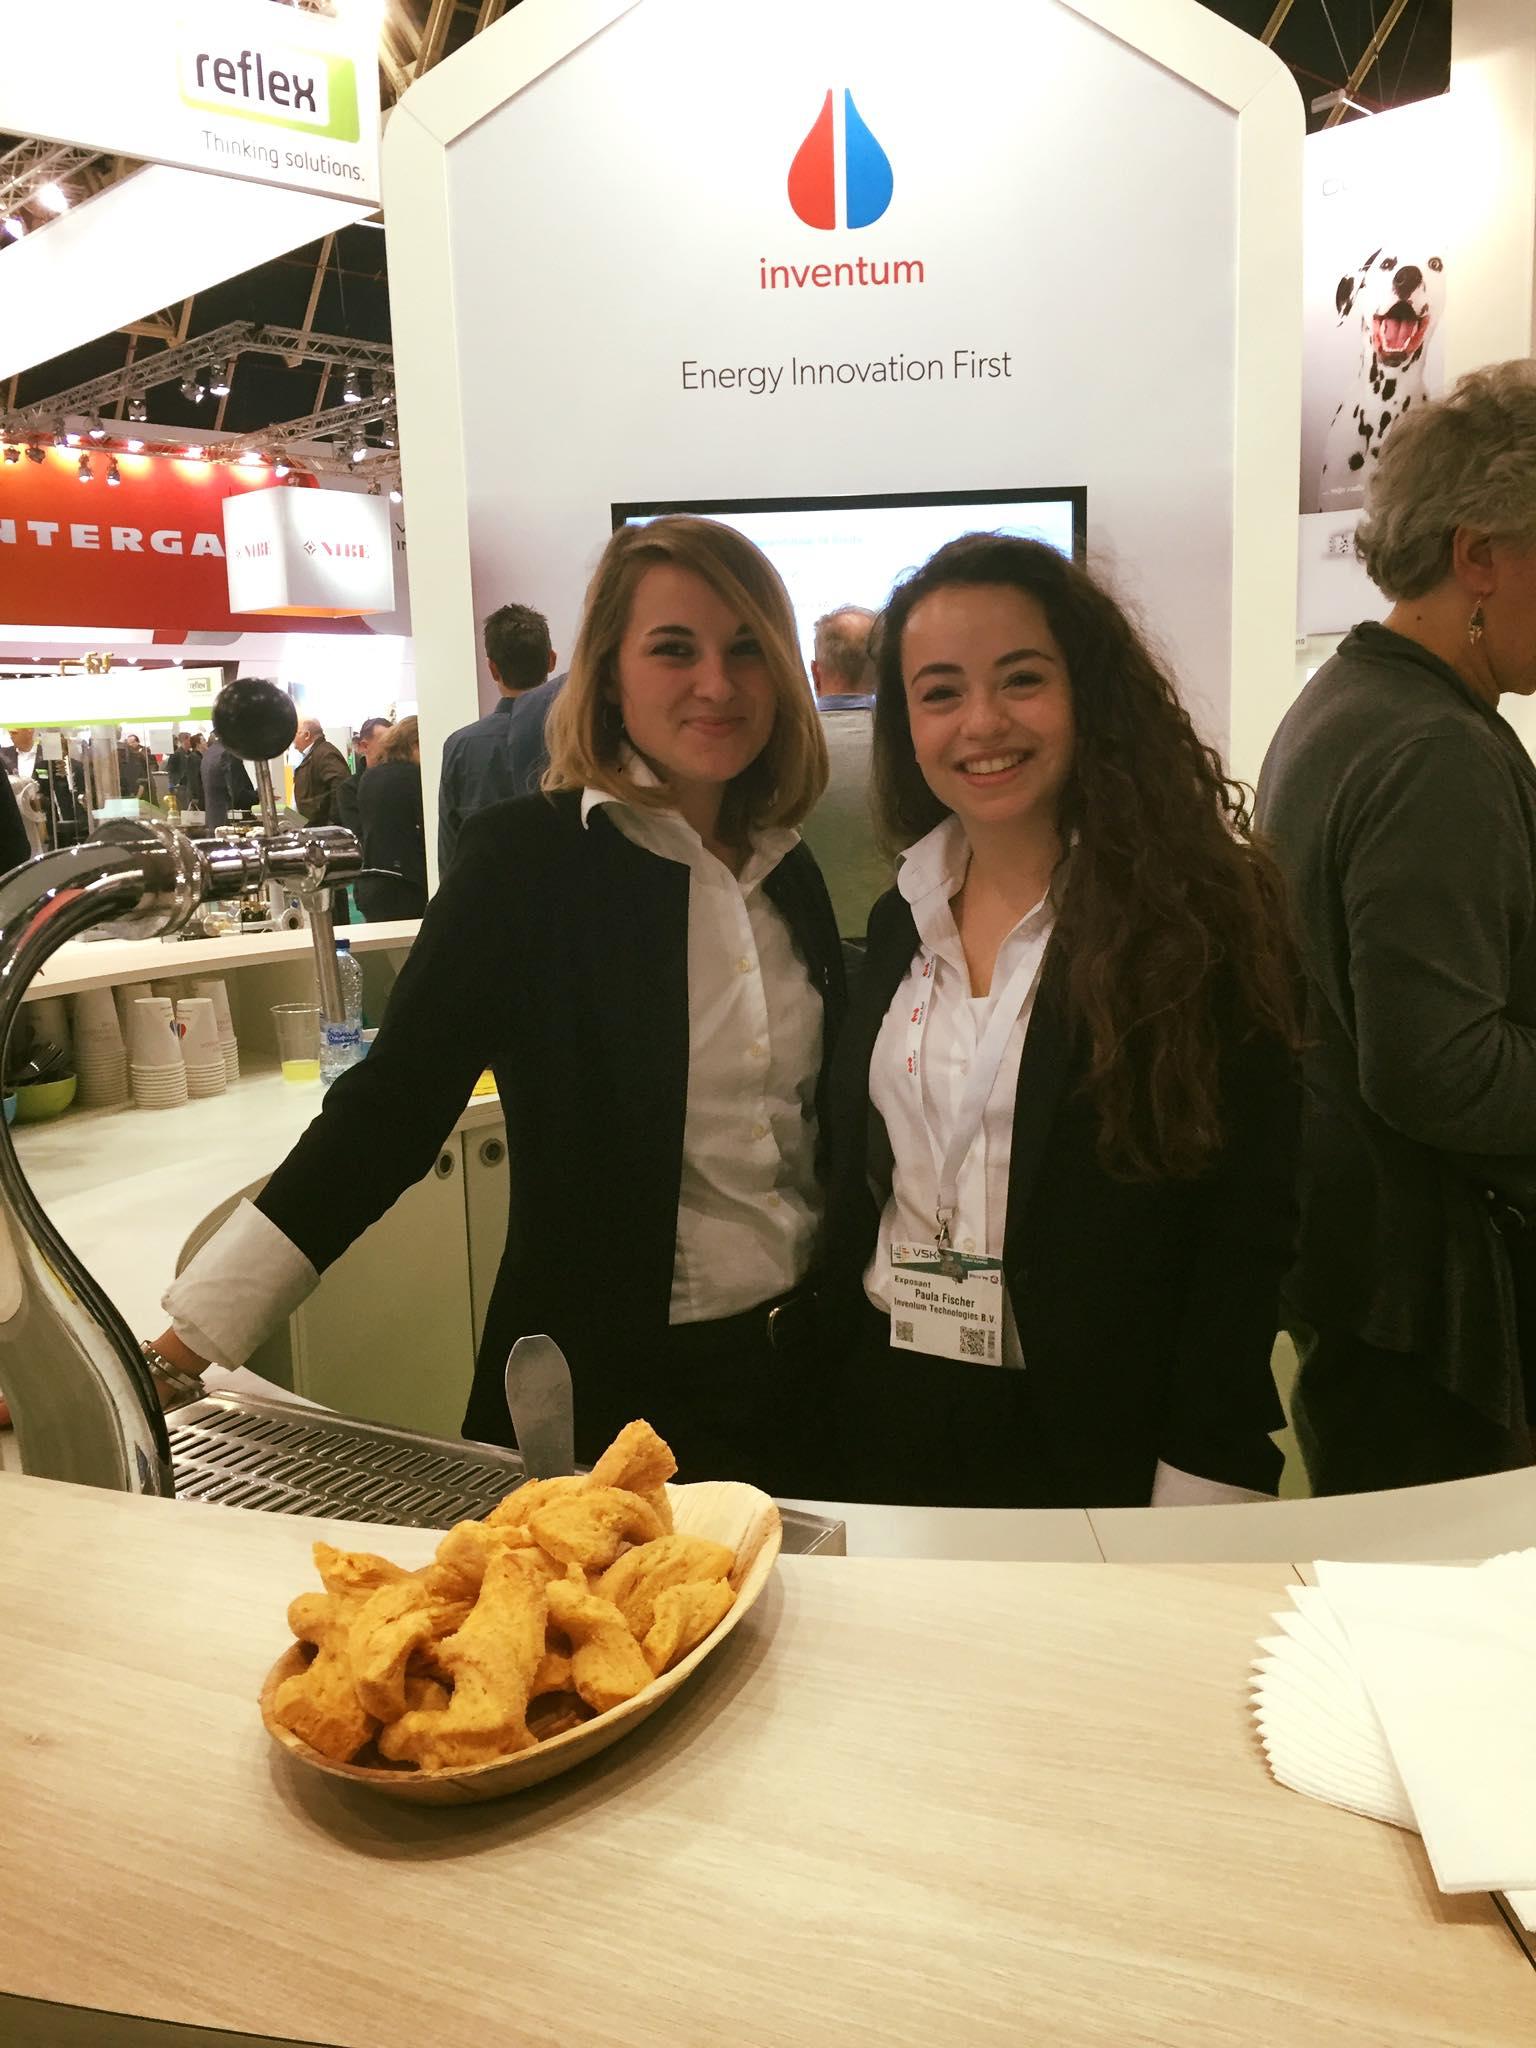 Segways campagne in Den Haag met hostesses van GoodDay Hospitality